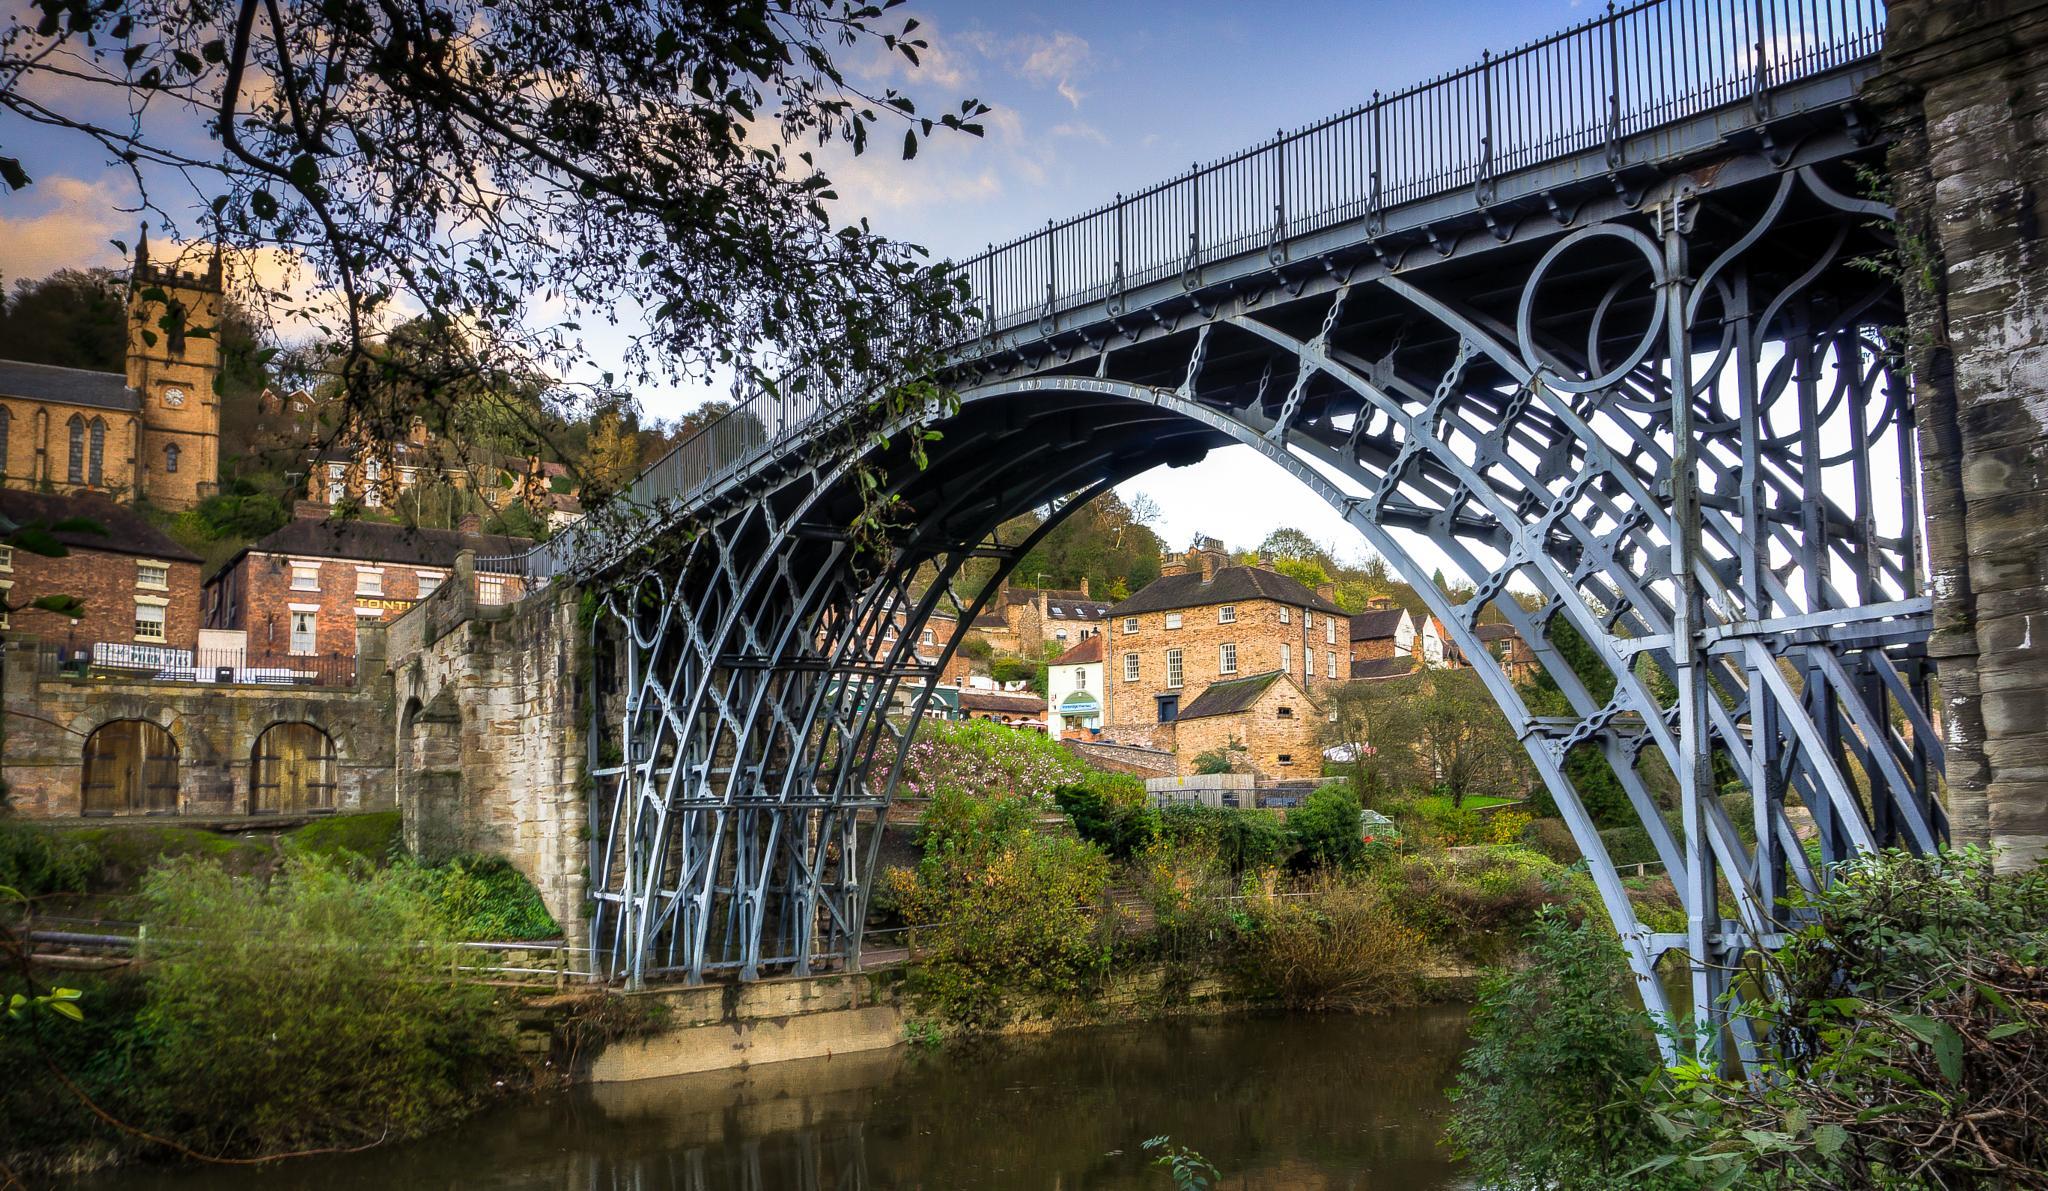 The Iron Bridge at Ironbridge, Shropshire by Jackie Evans